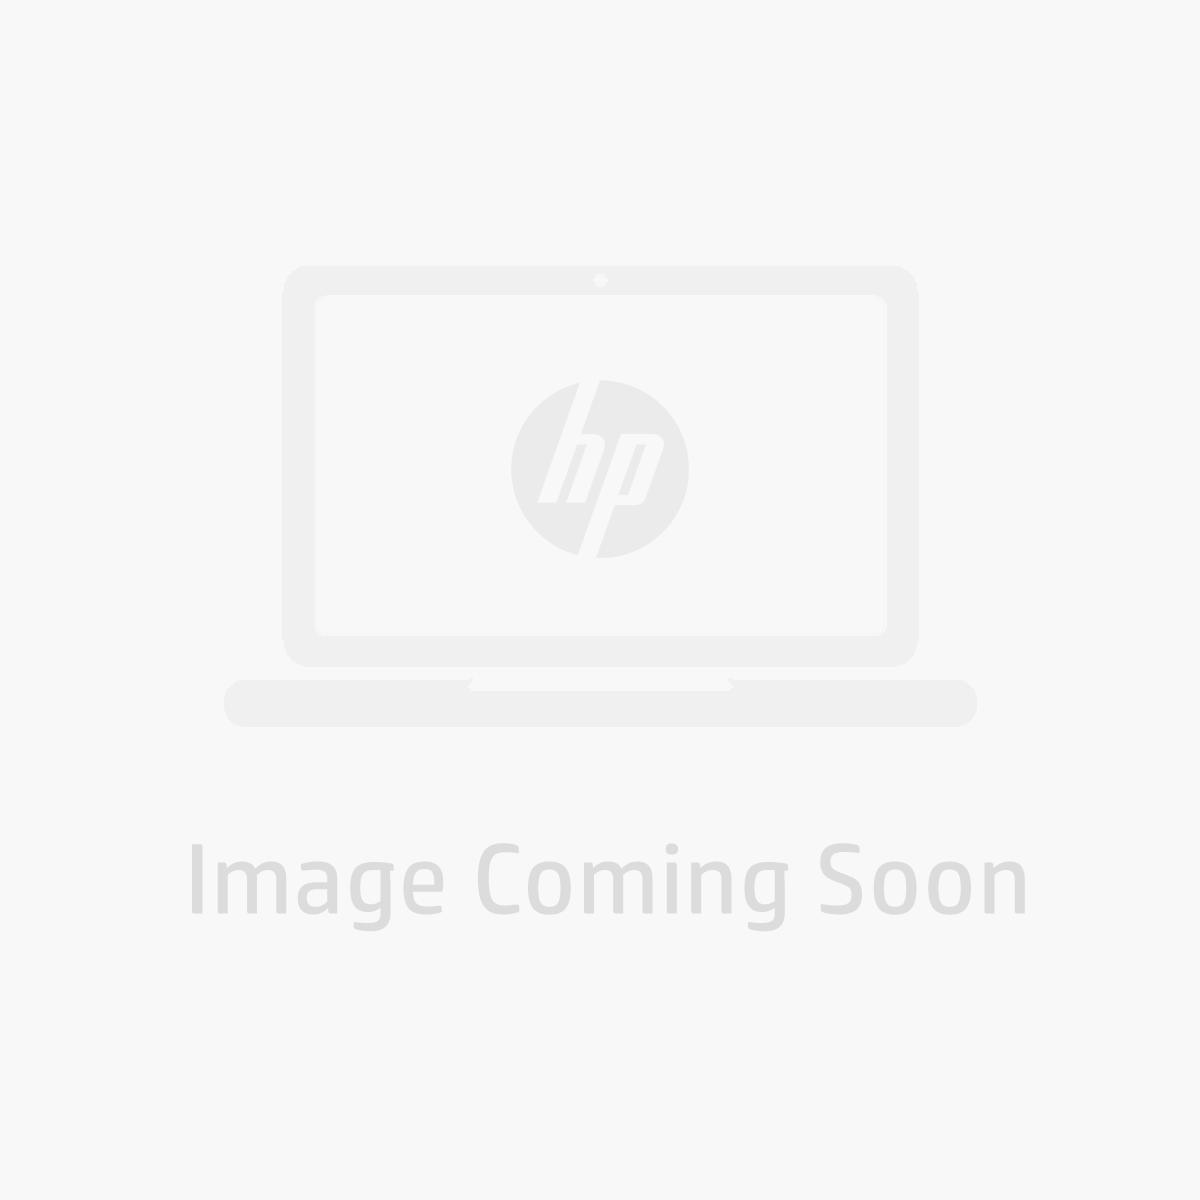 HP 650 Ink Advantage Bundle